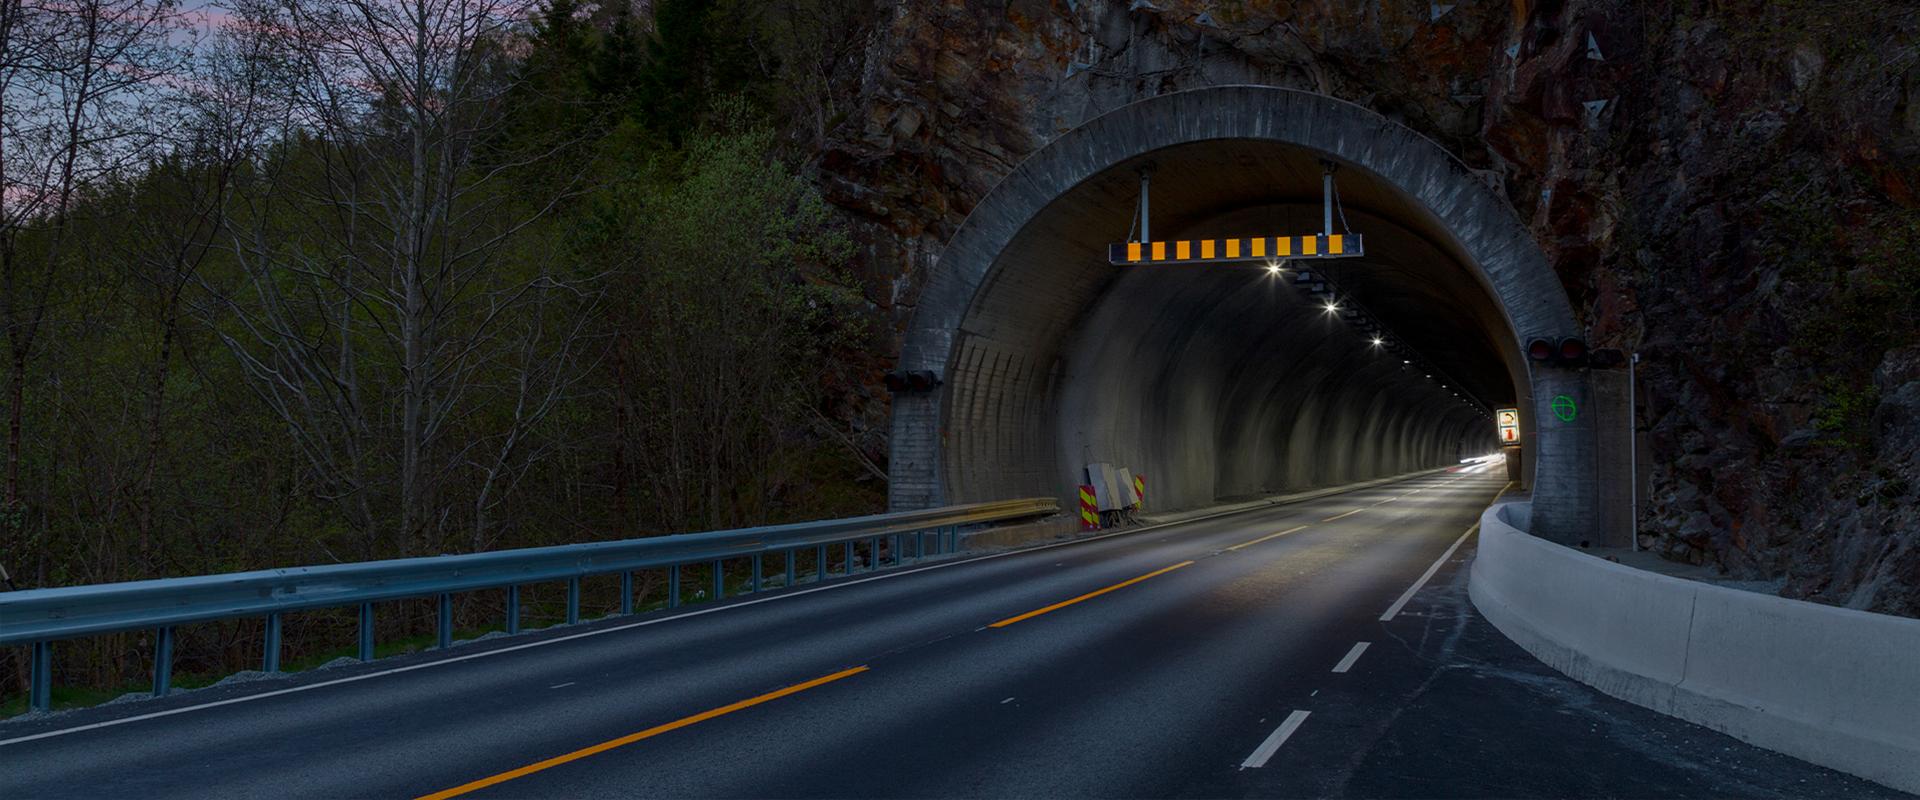 Faro LED gallerie stradali